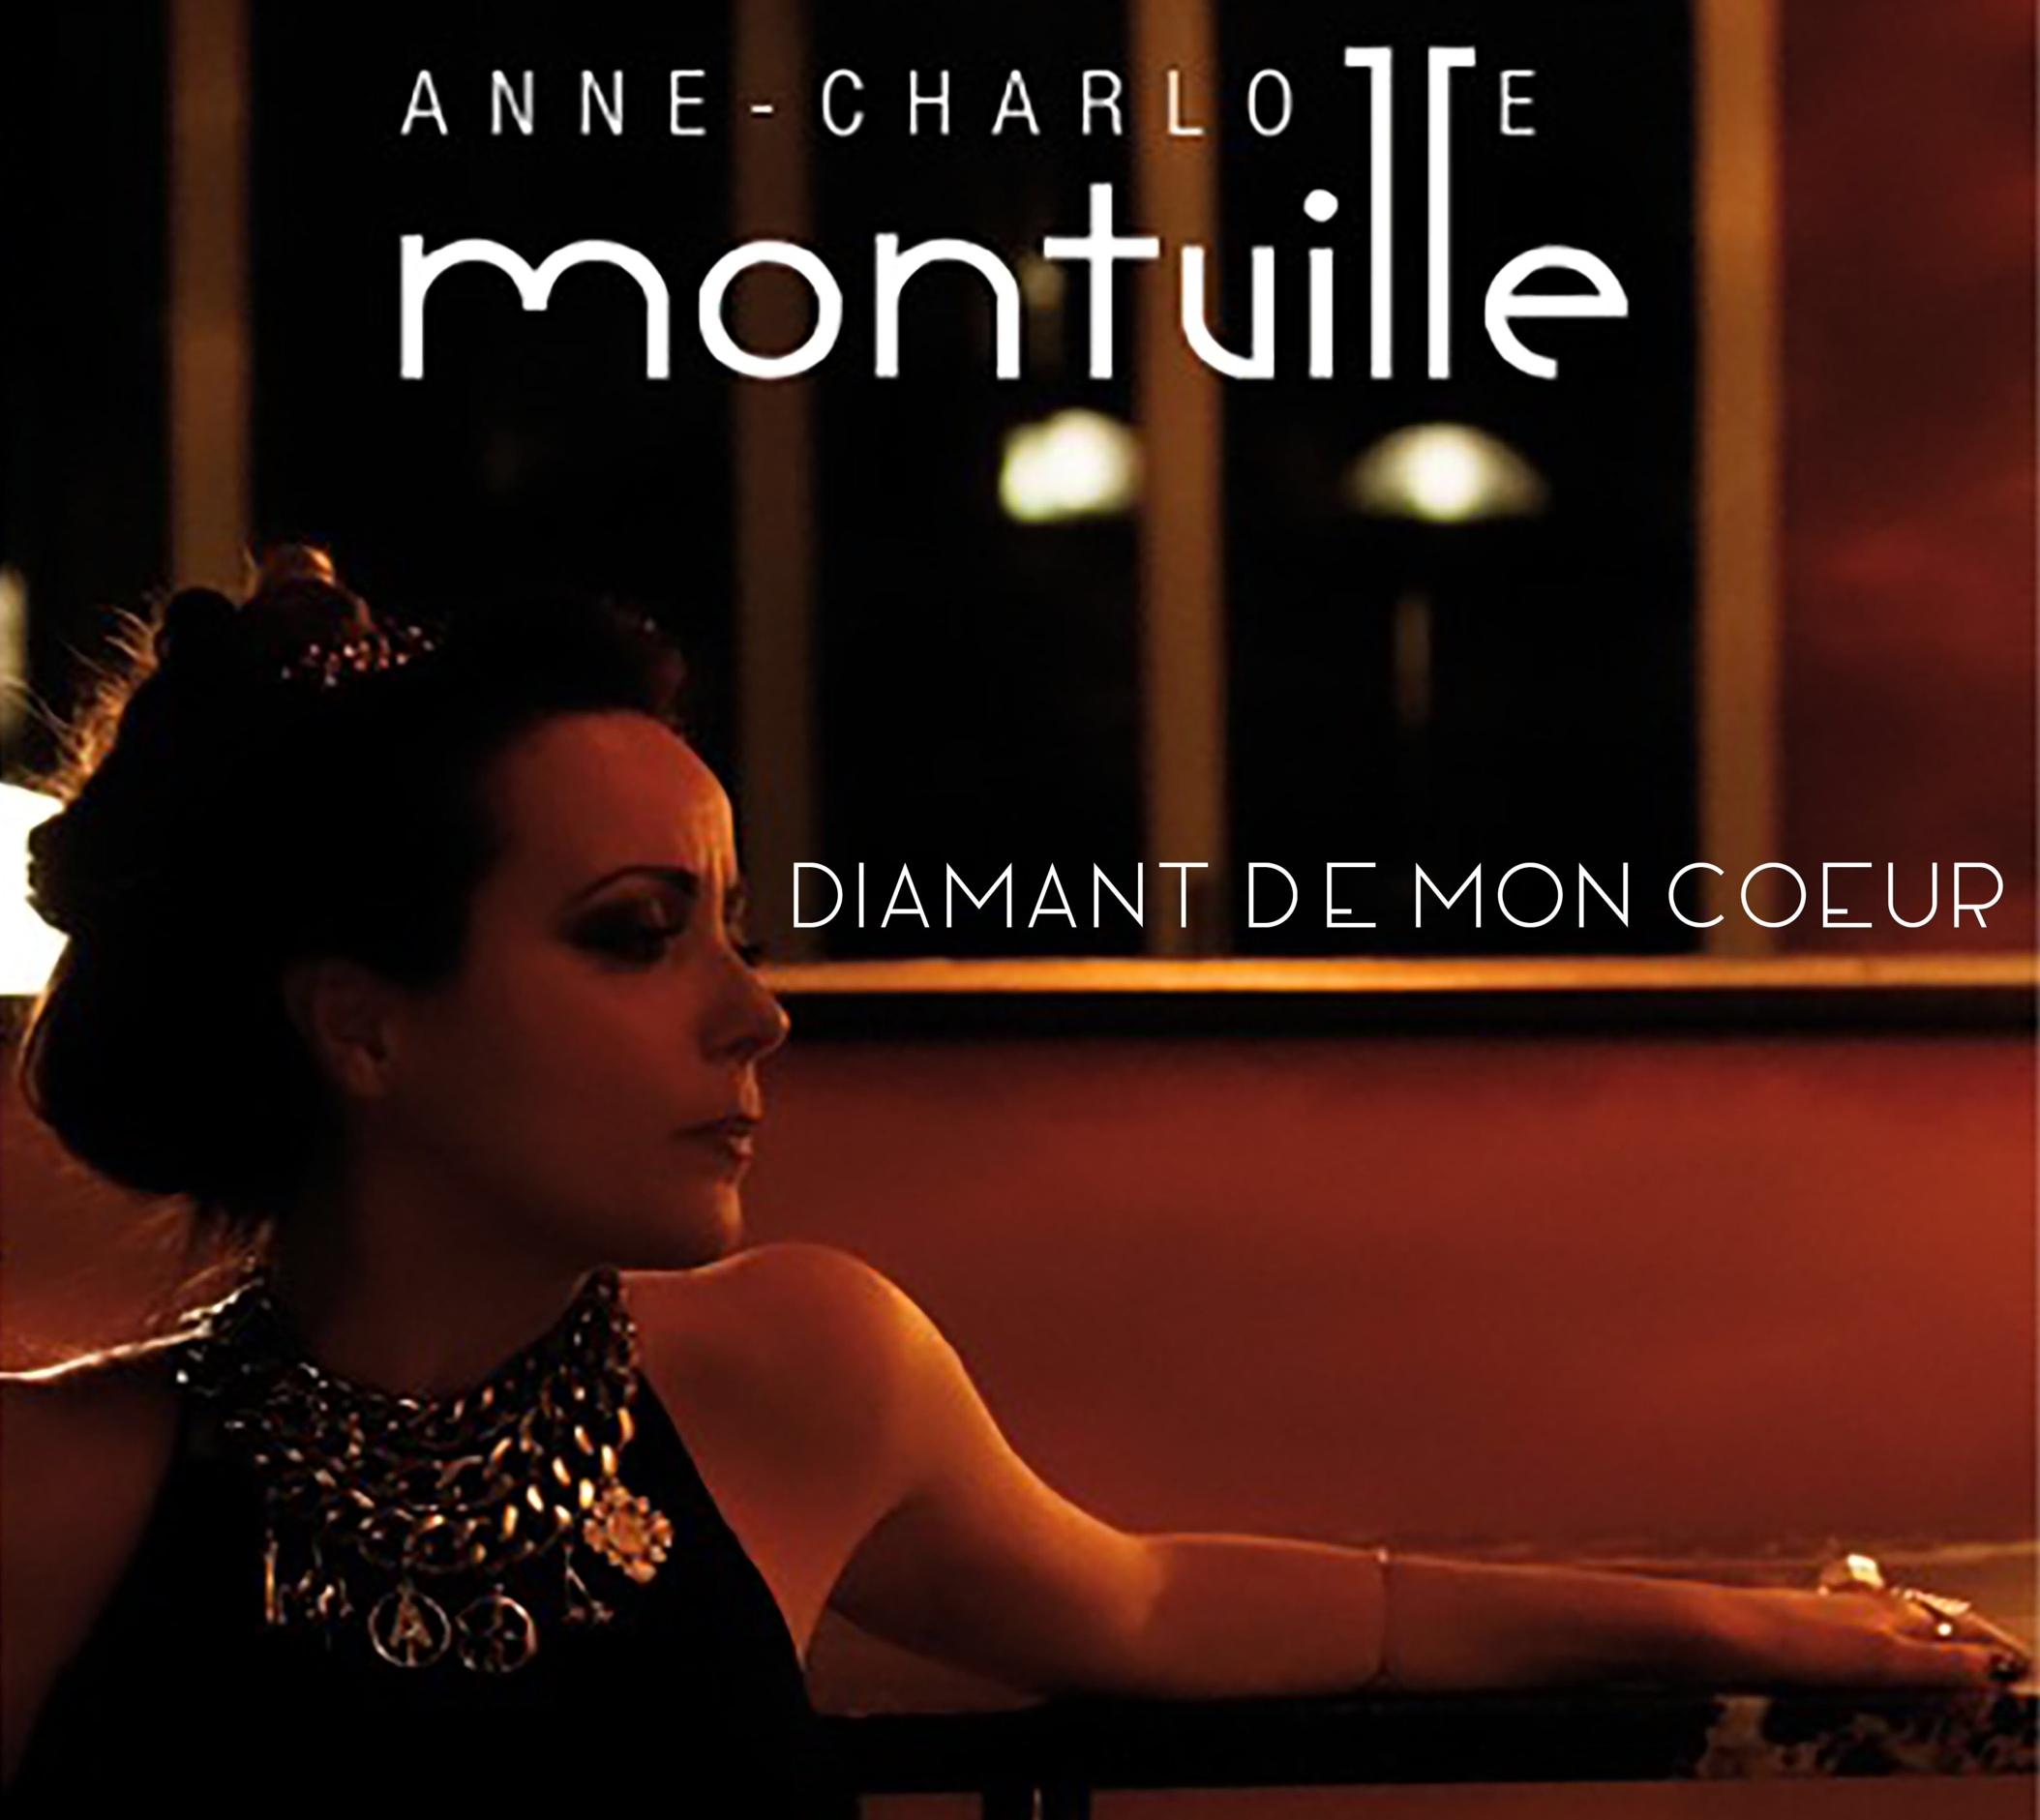 DIAMANT DE MON COEUR.jpg